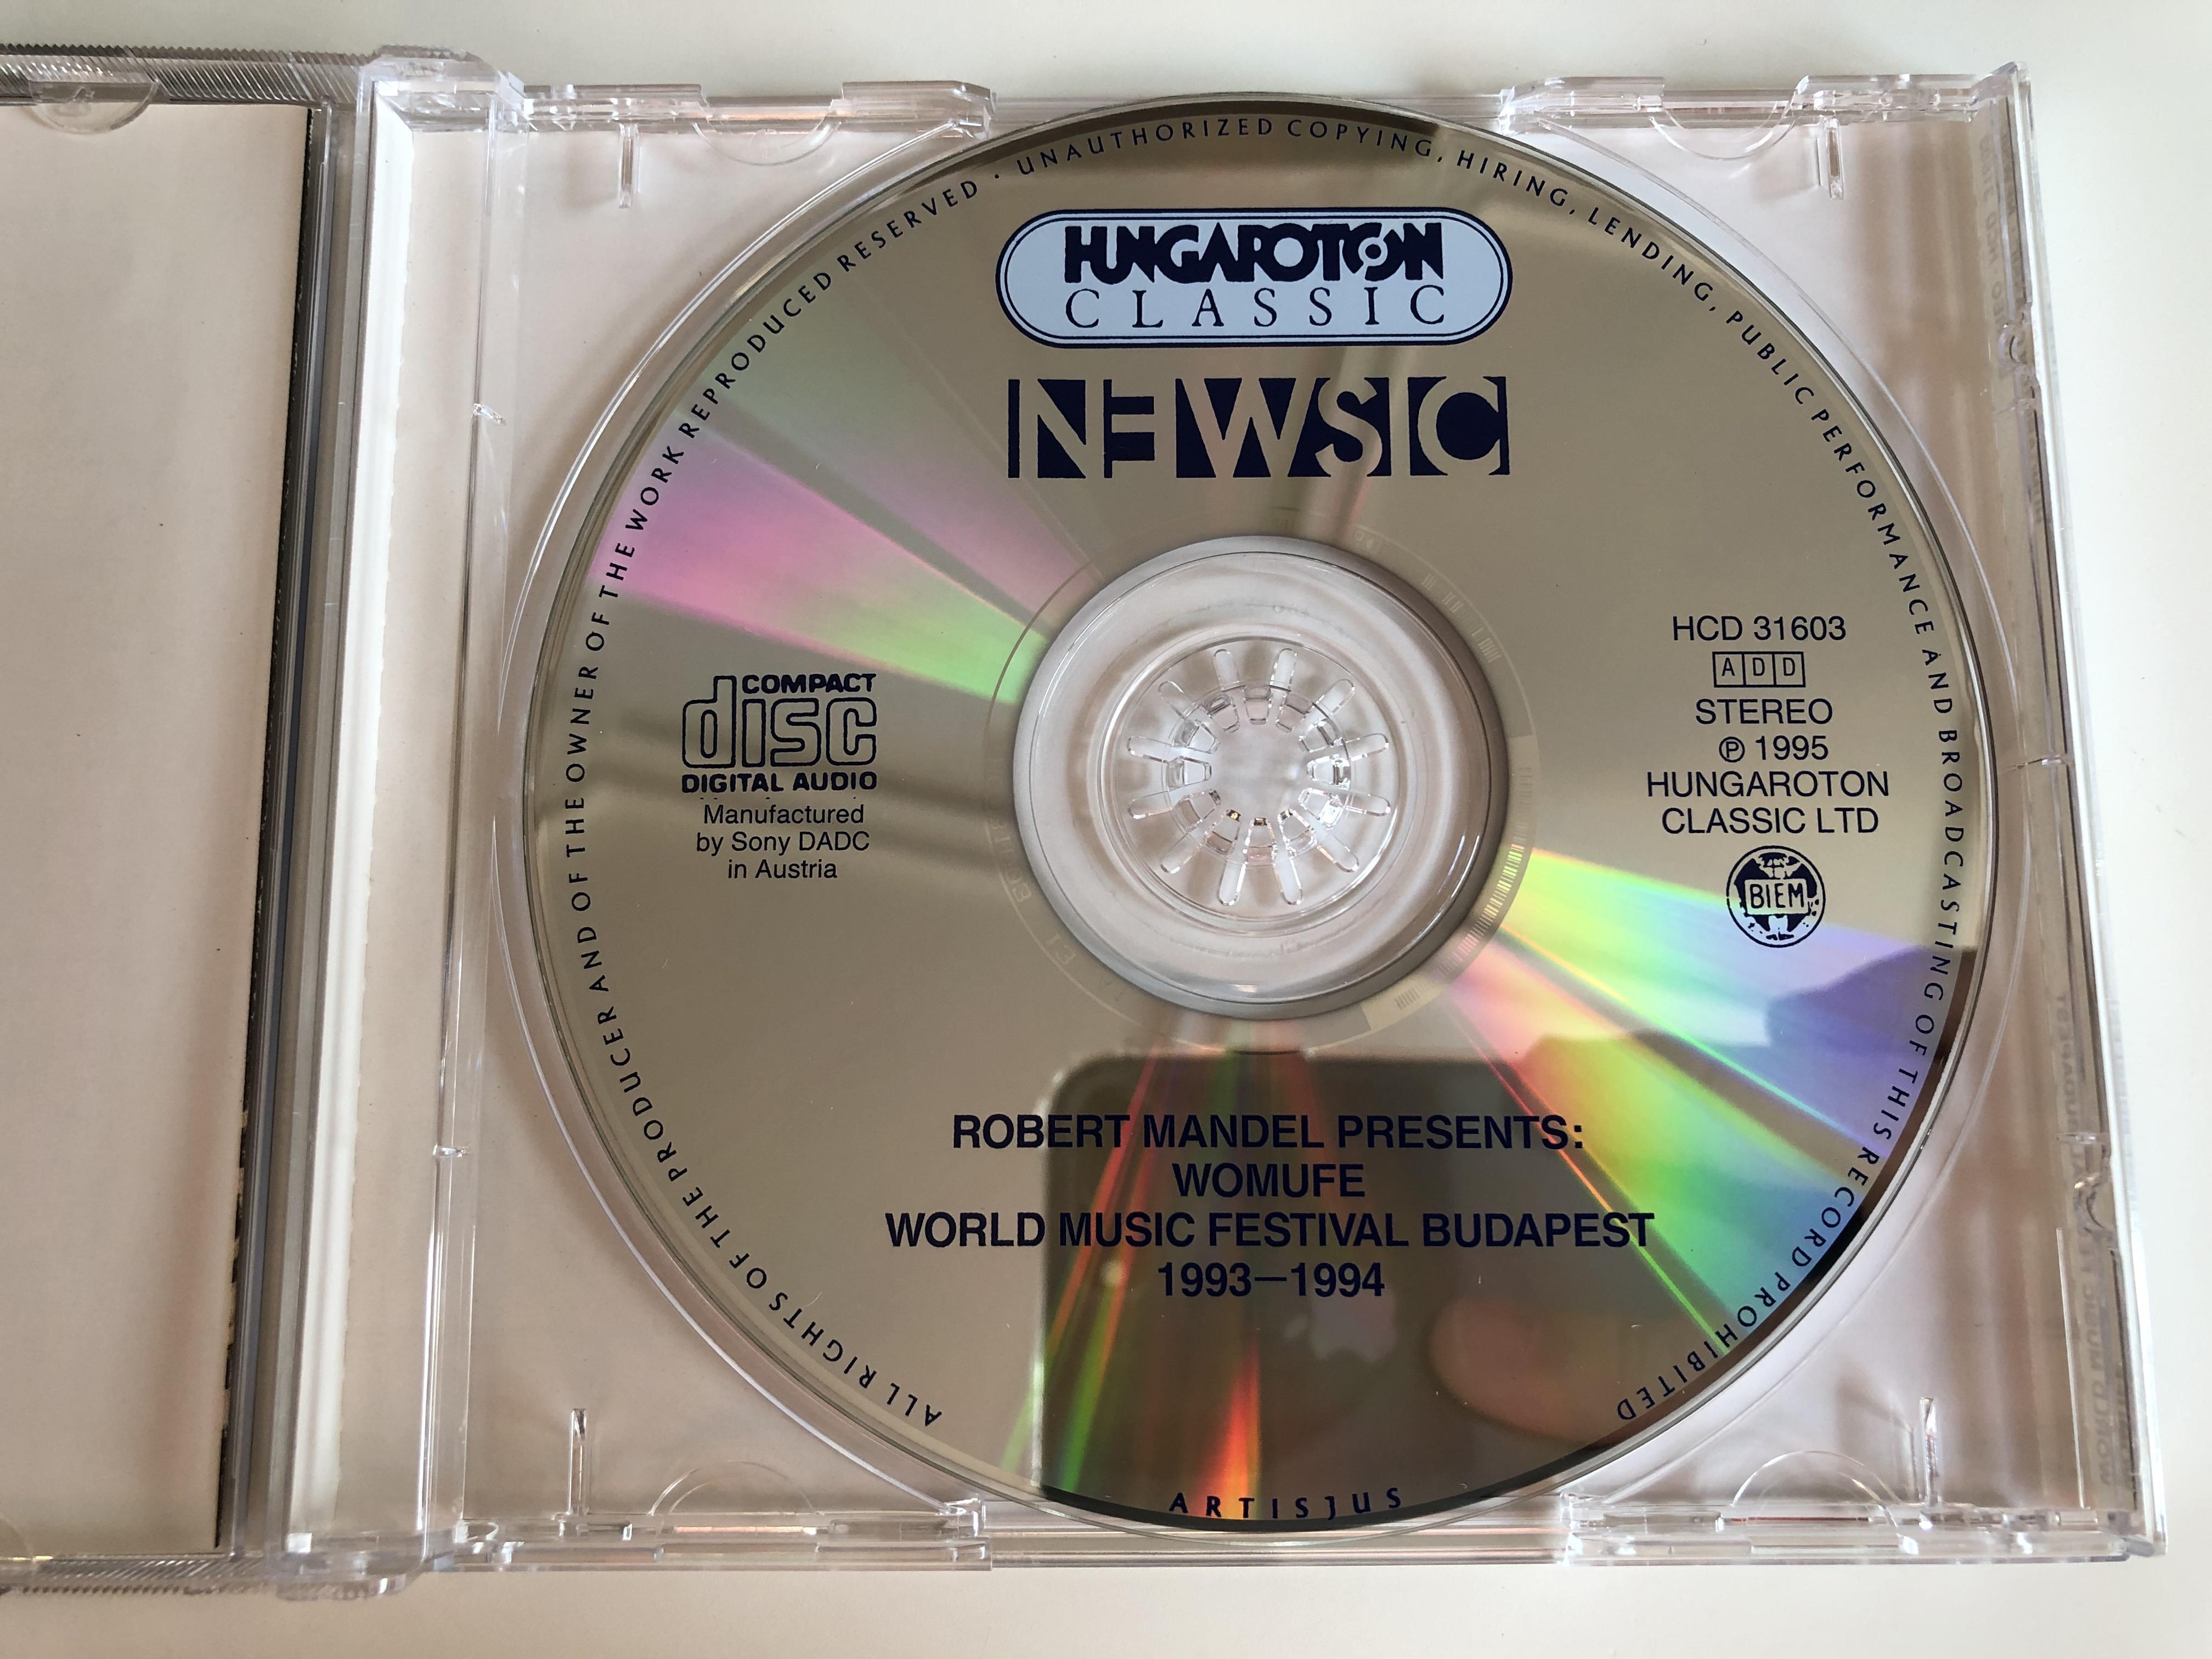 womufe-world-music-festival-budapest-produced-by-robert-mandel-hungaroton-classic-audio-cd-1995-stereo-hcd-31603-3-.jpg